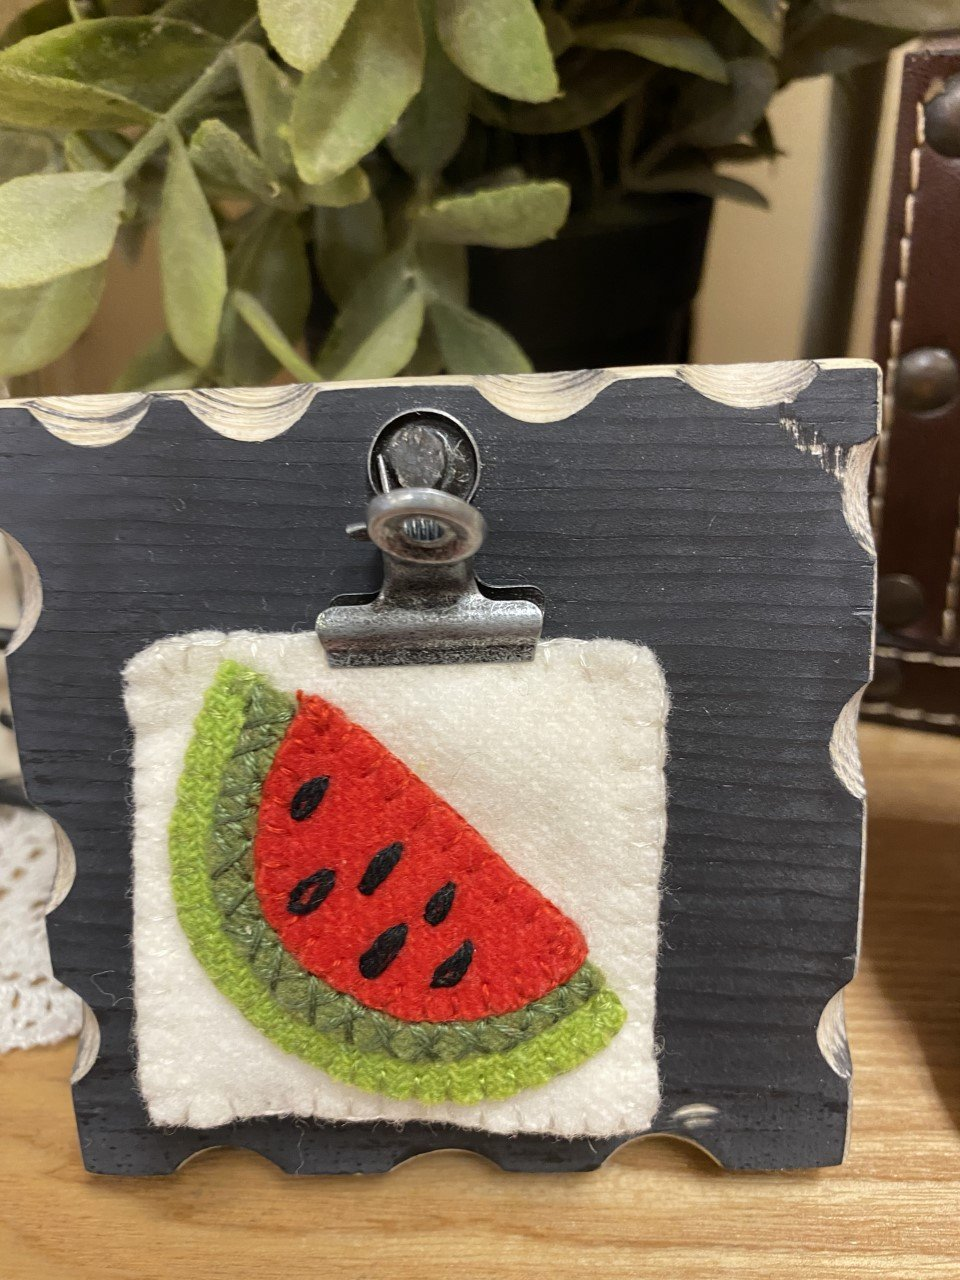 Itty Bitty Kit - Watermelon